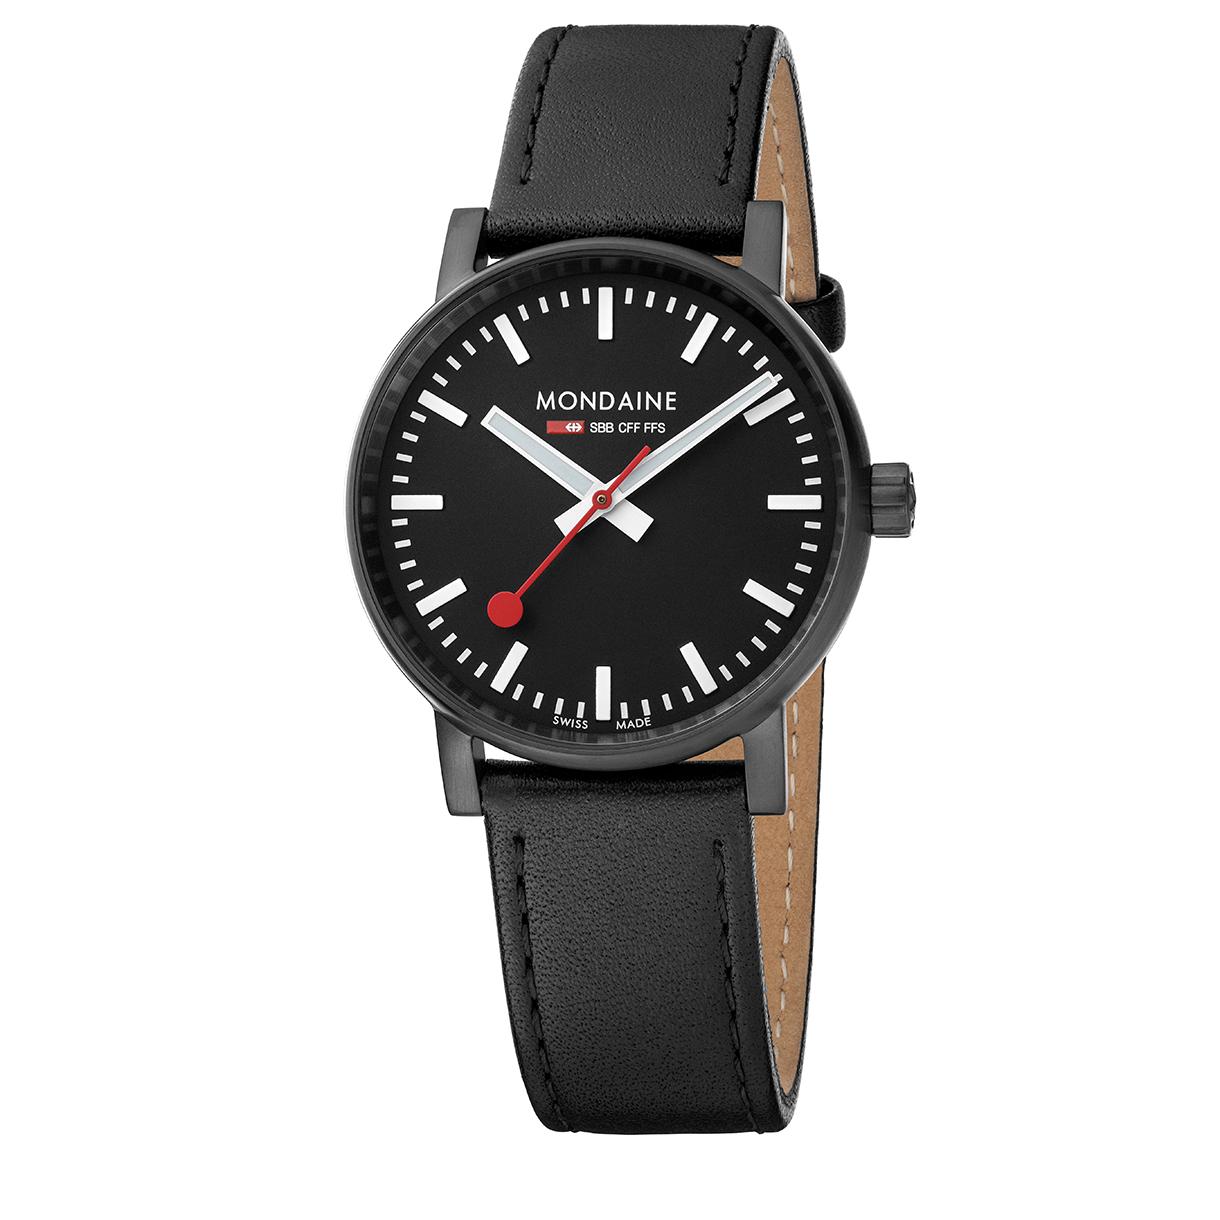 Mondaine Evo2 35 Mm Mondaine Watches Amp Clocks